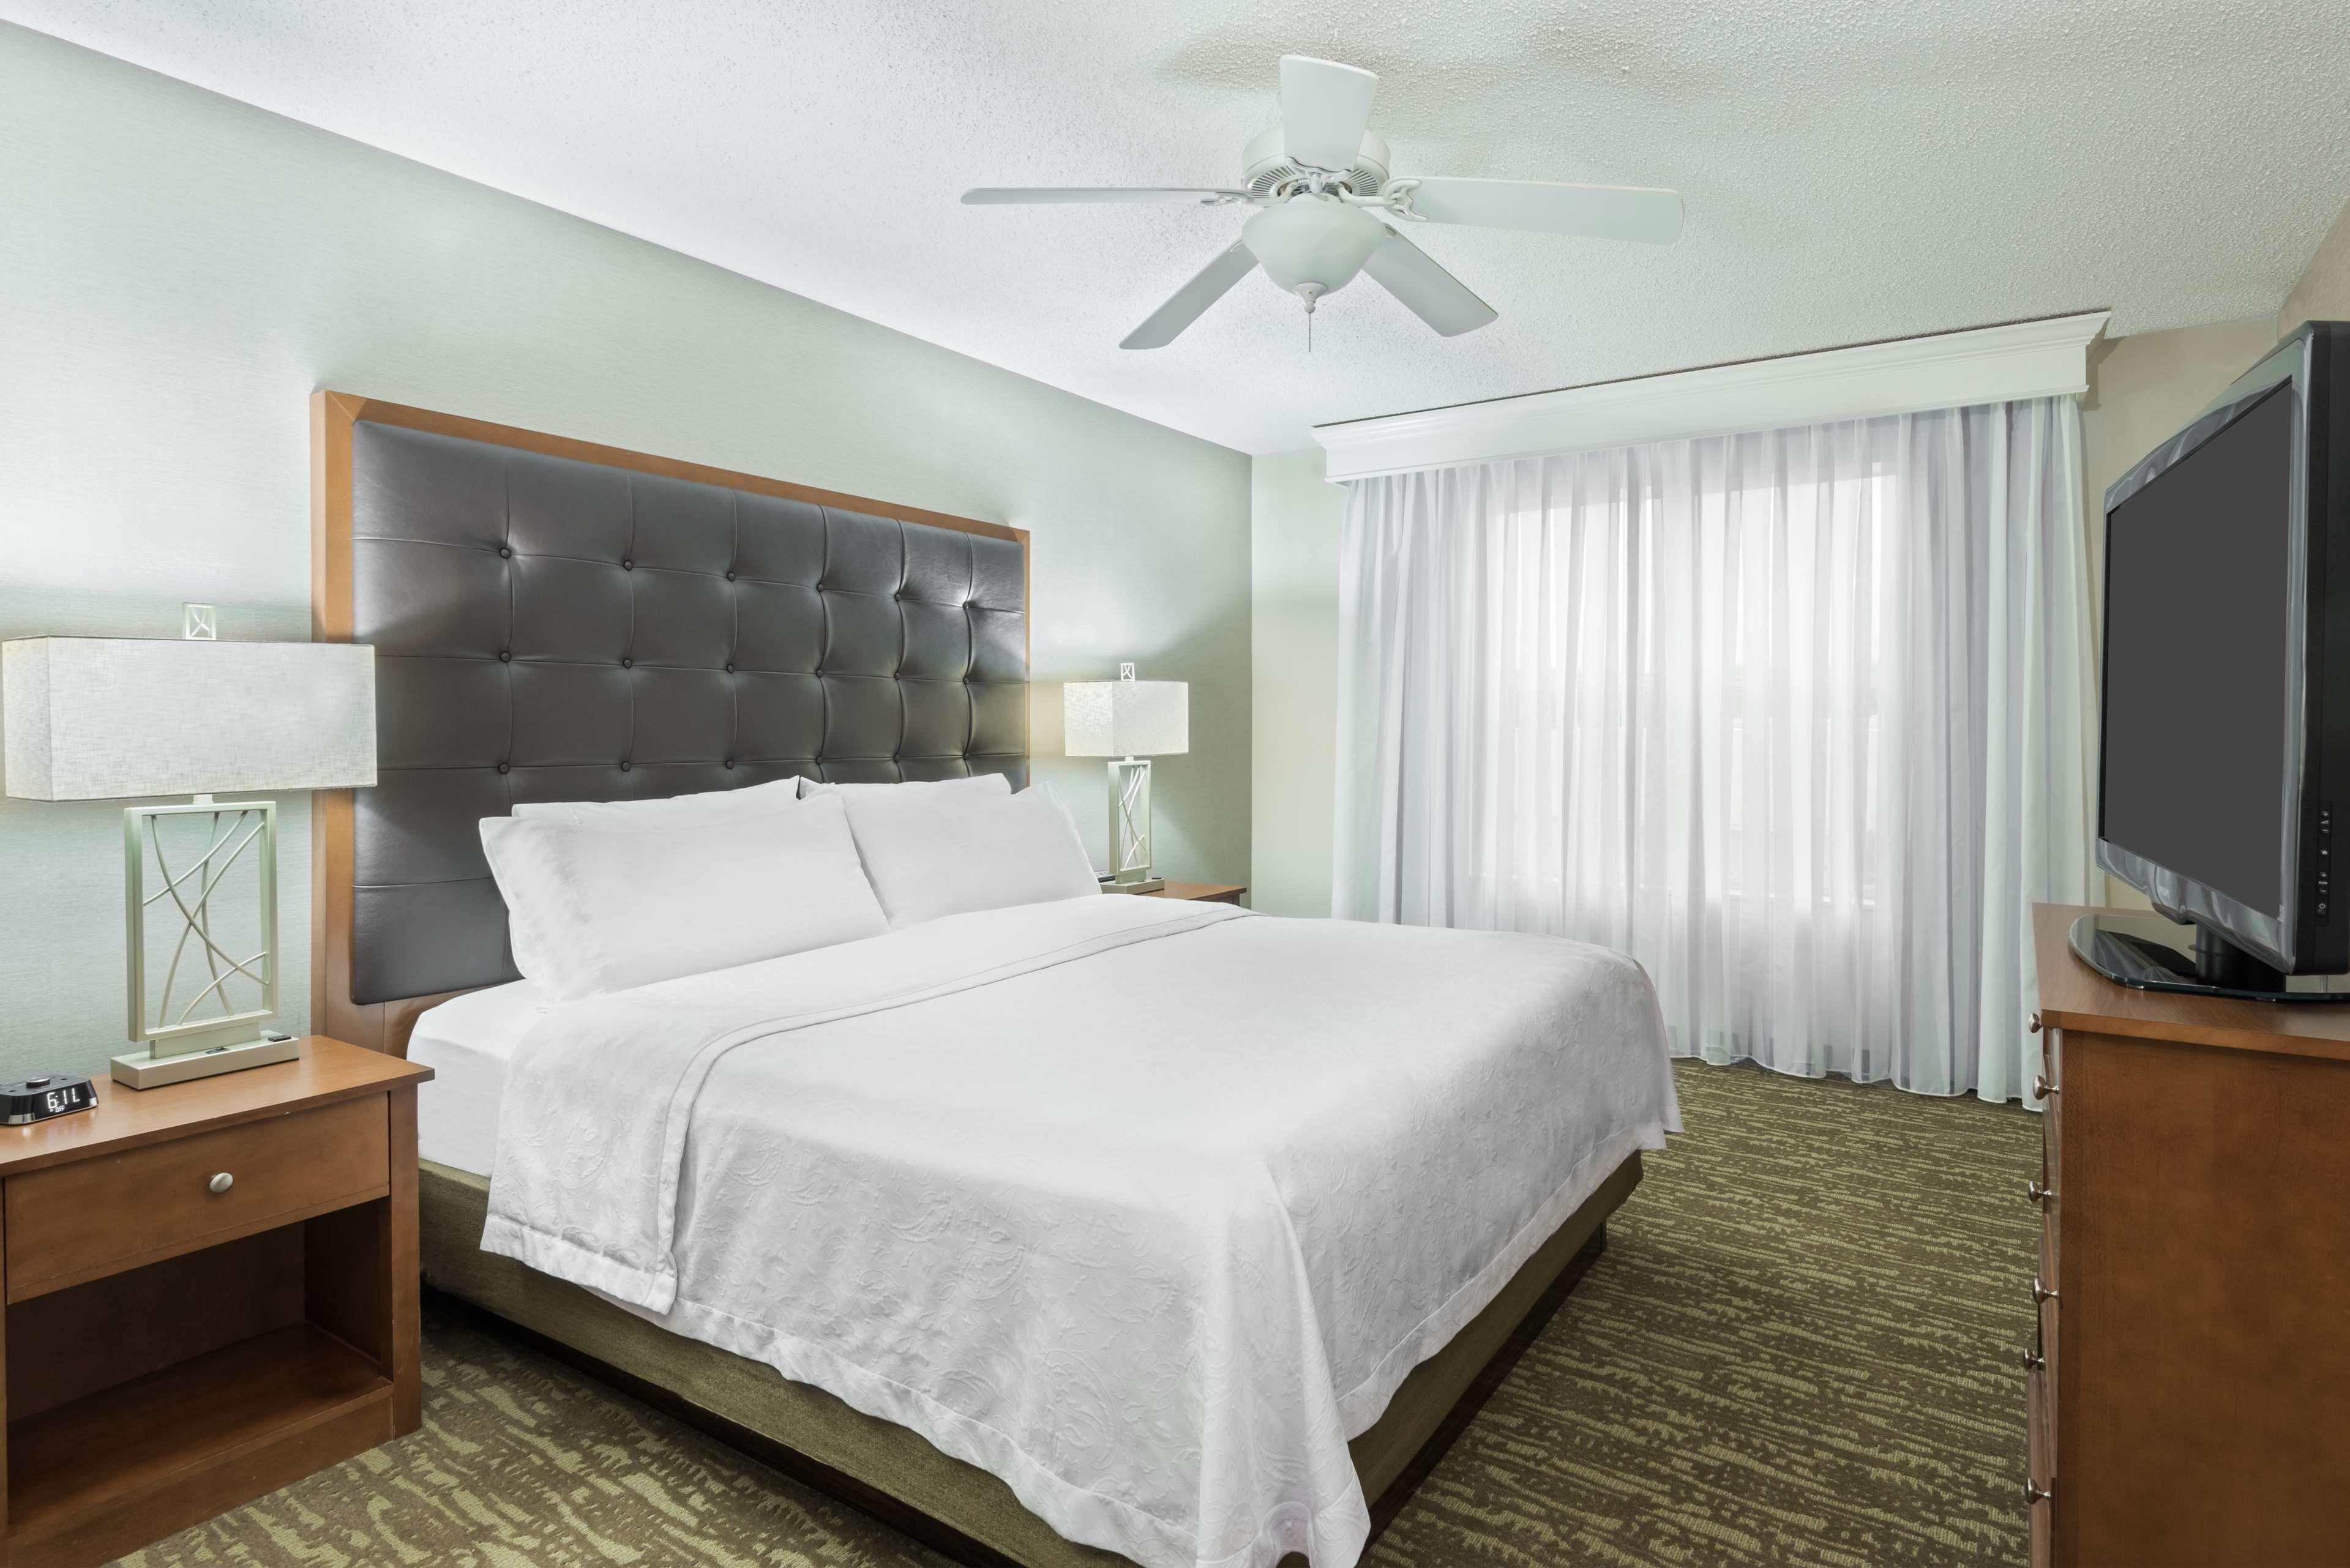 Homewood Suites by Hilton Holyoke-Springfield/North image 23